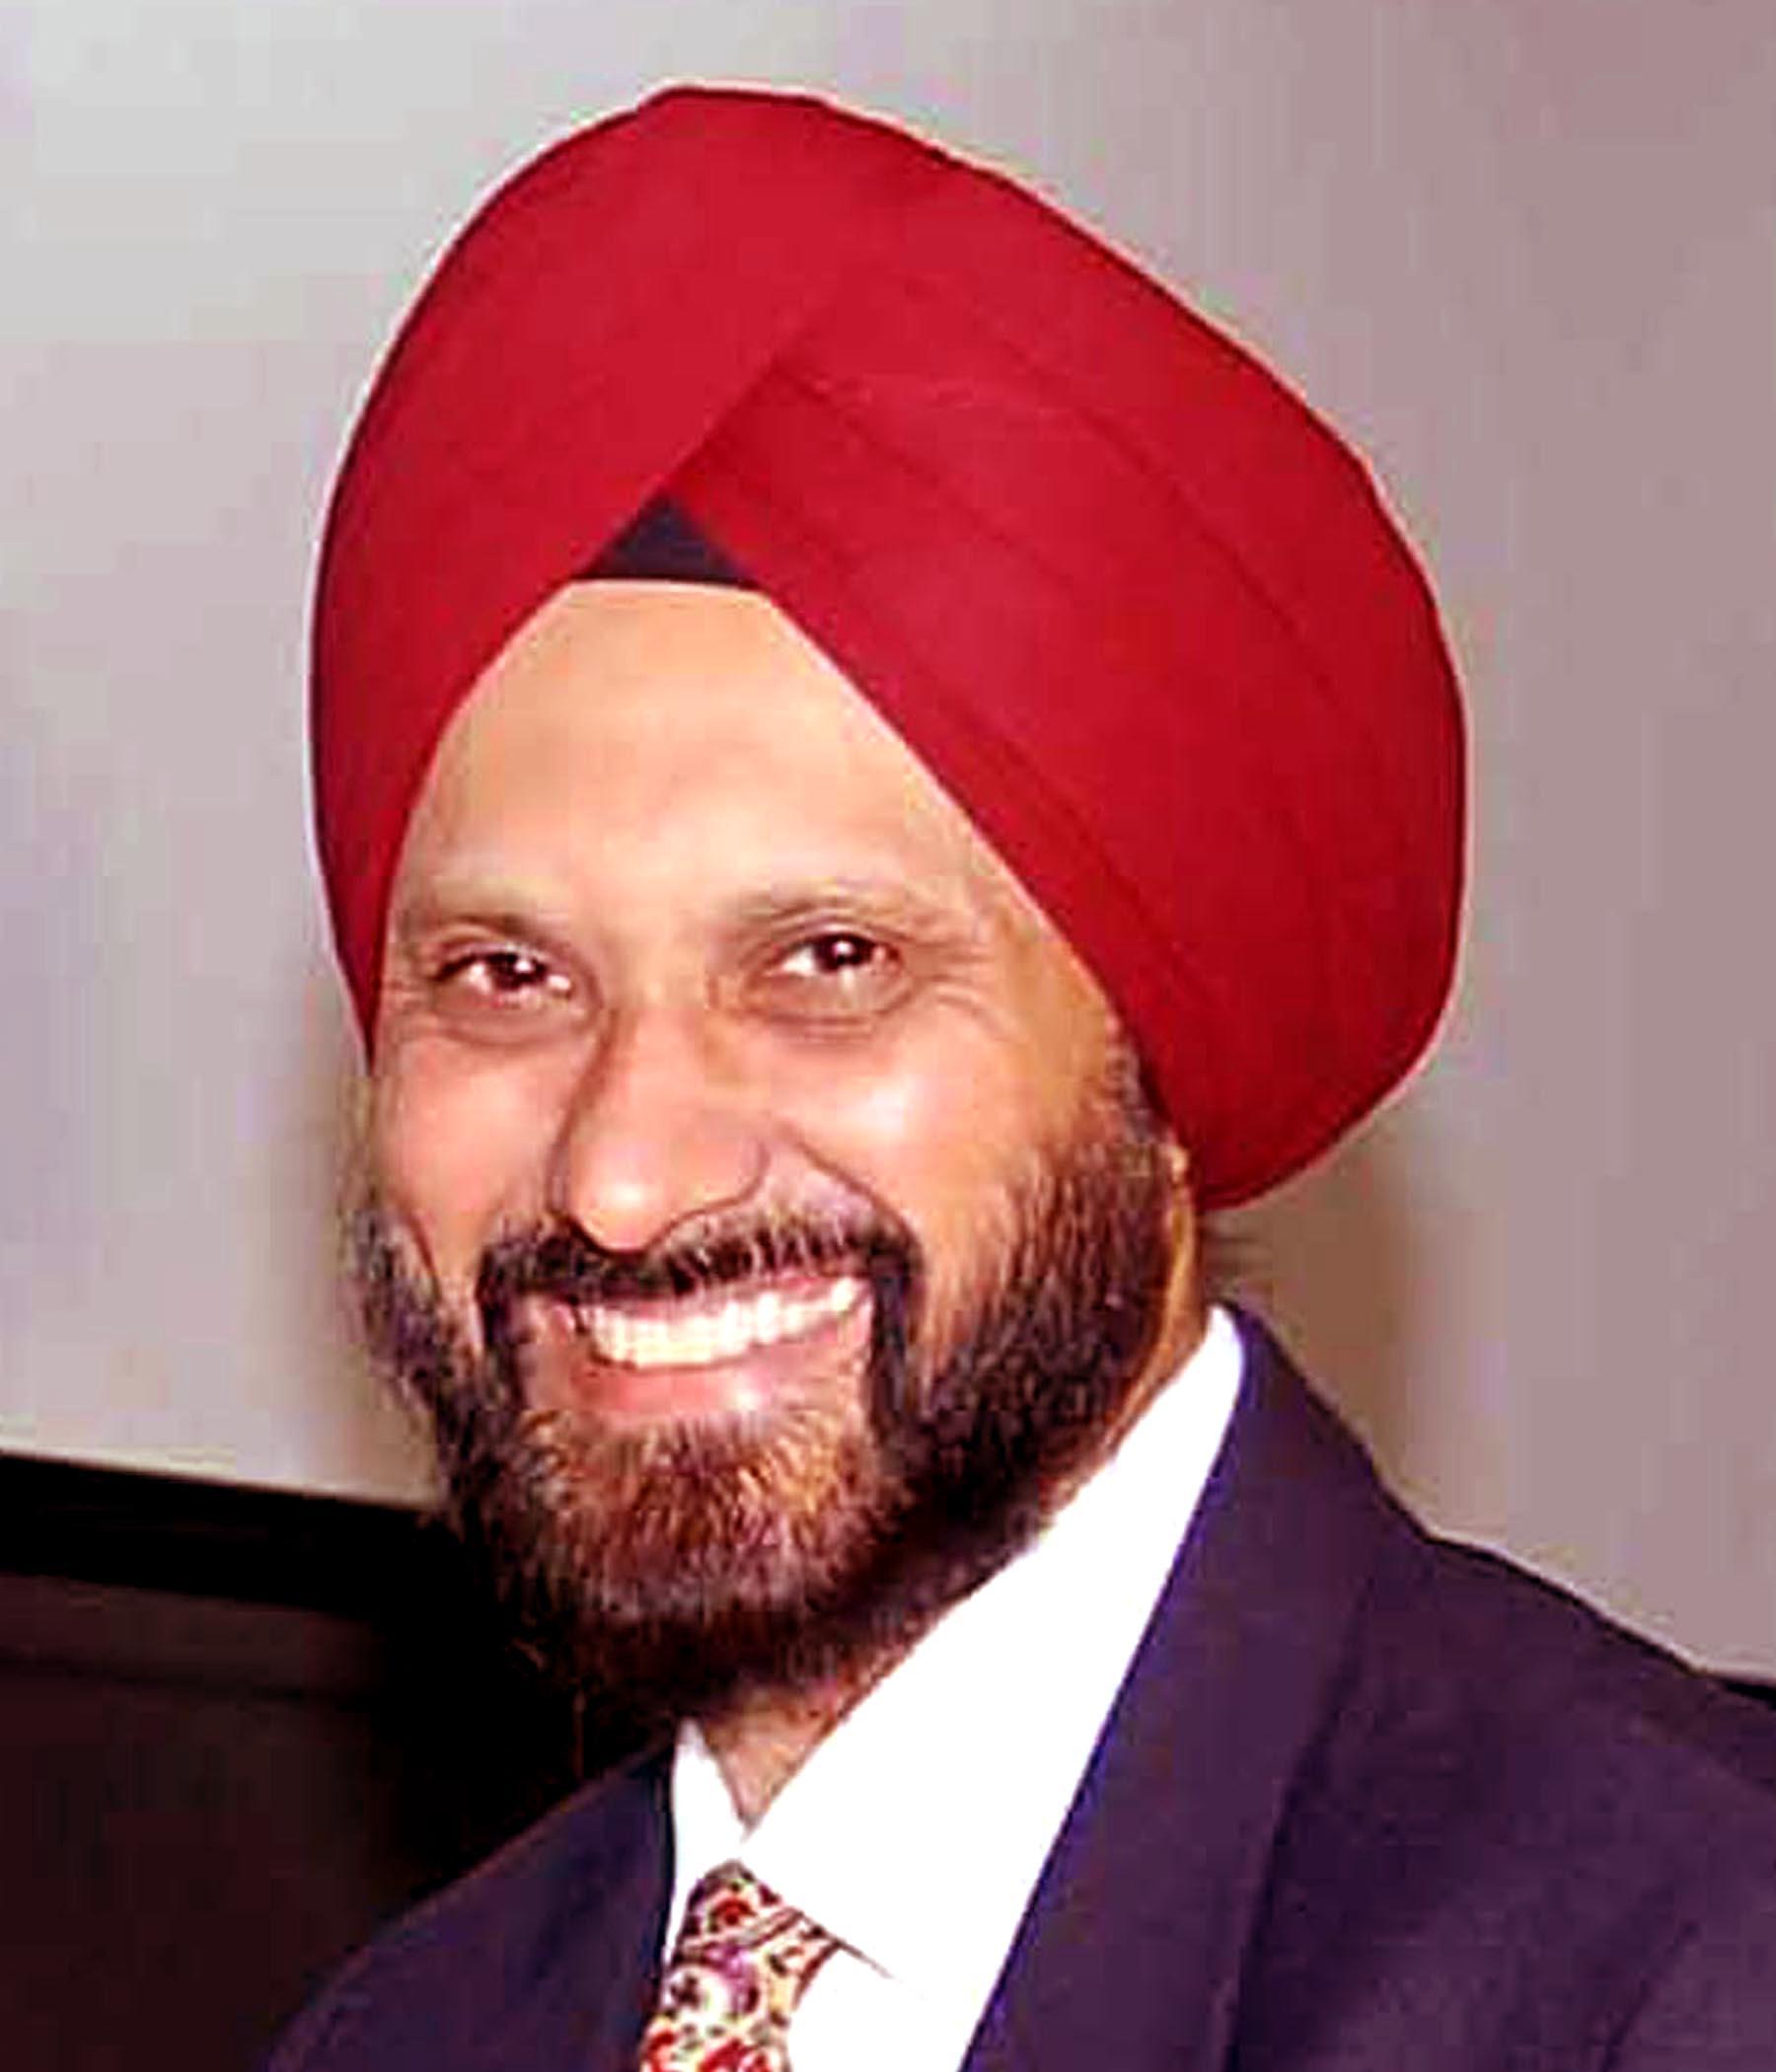 Opinion: Despite empty seats CTVS still retains its glory - Dr HS Bedi